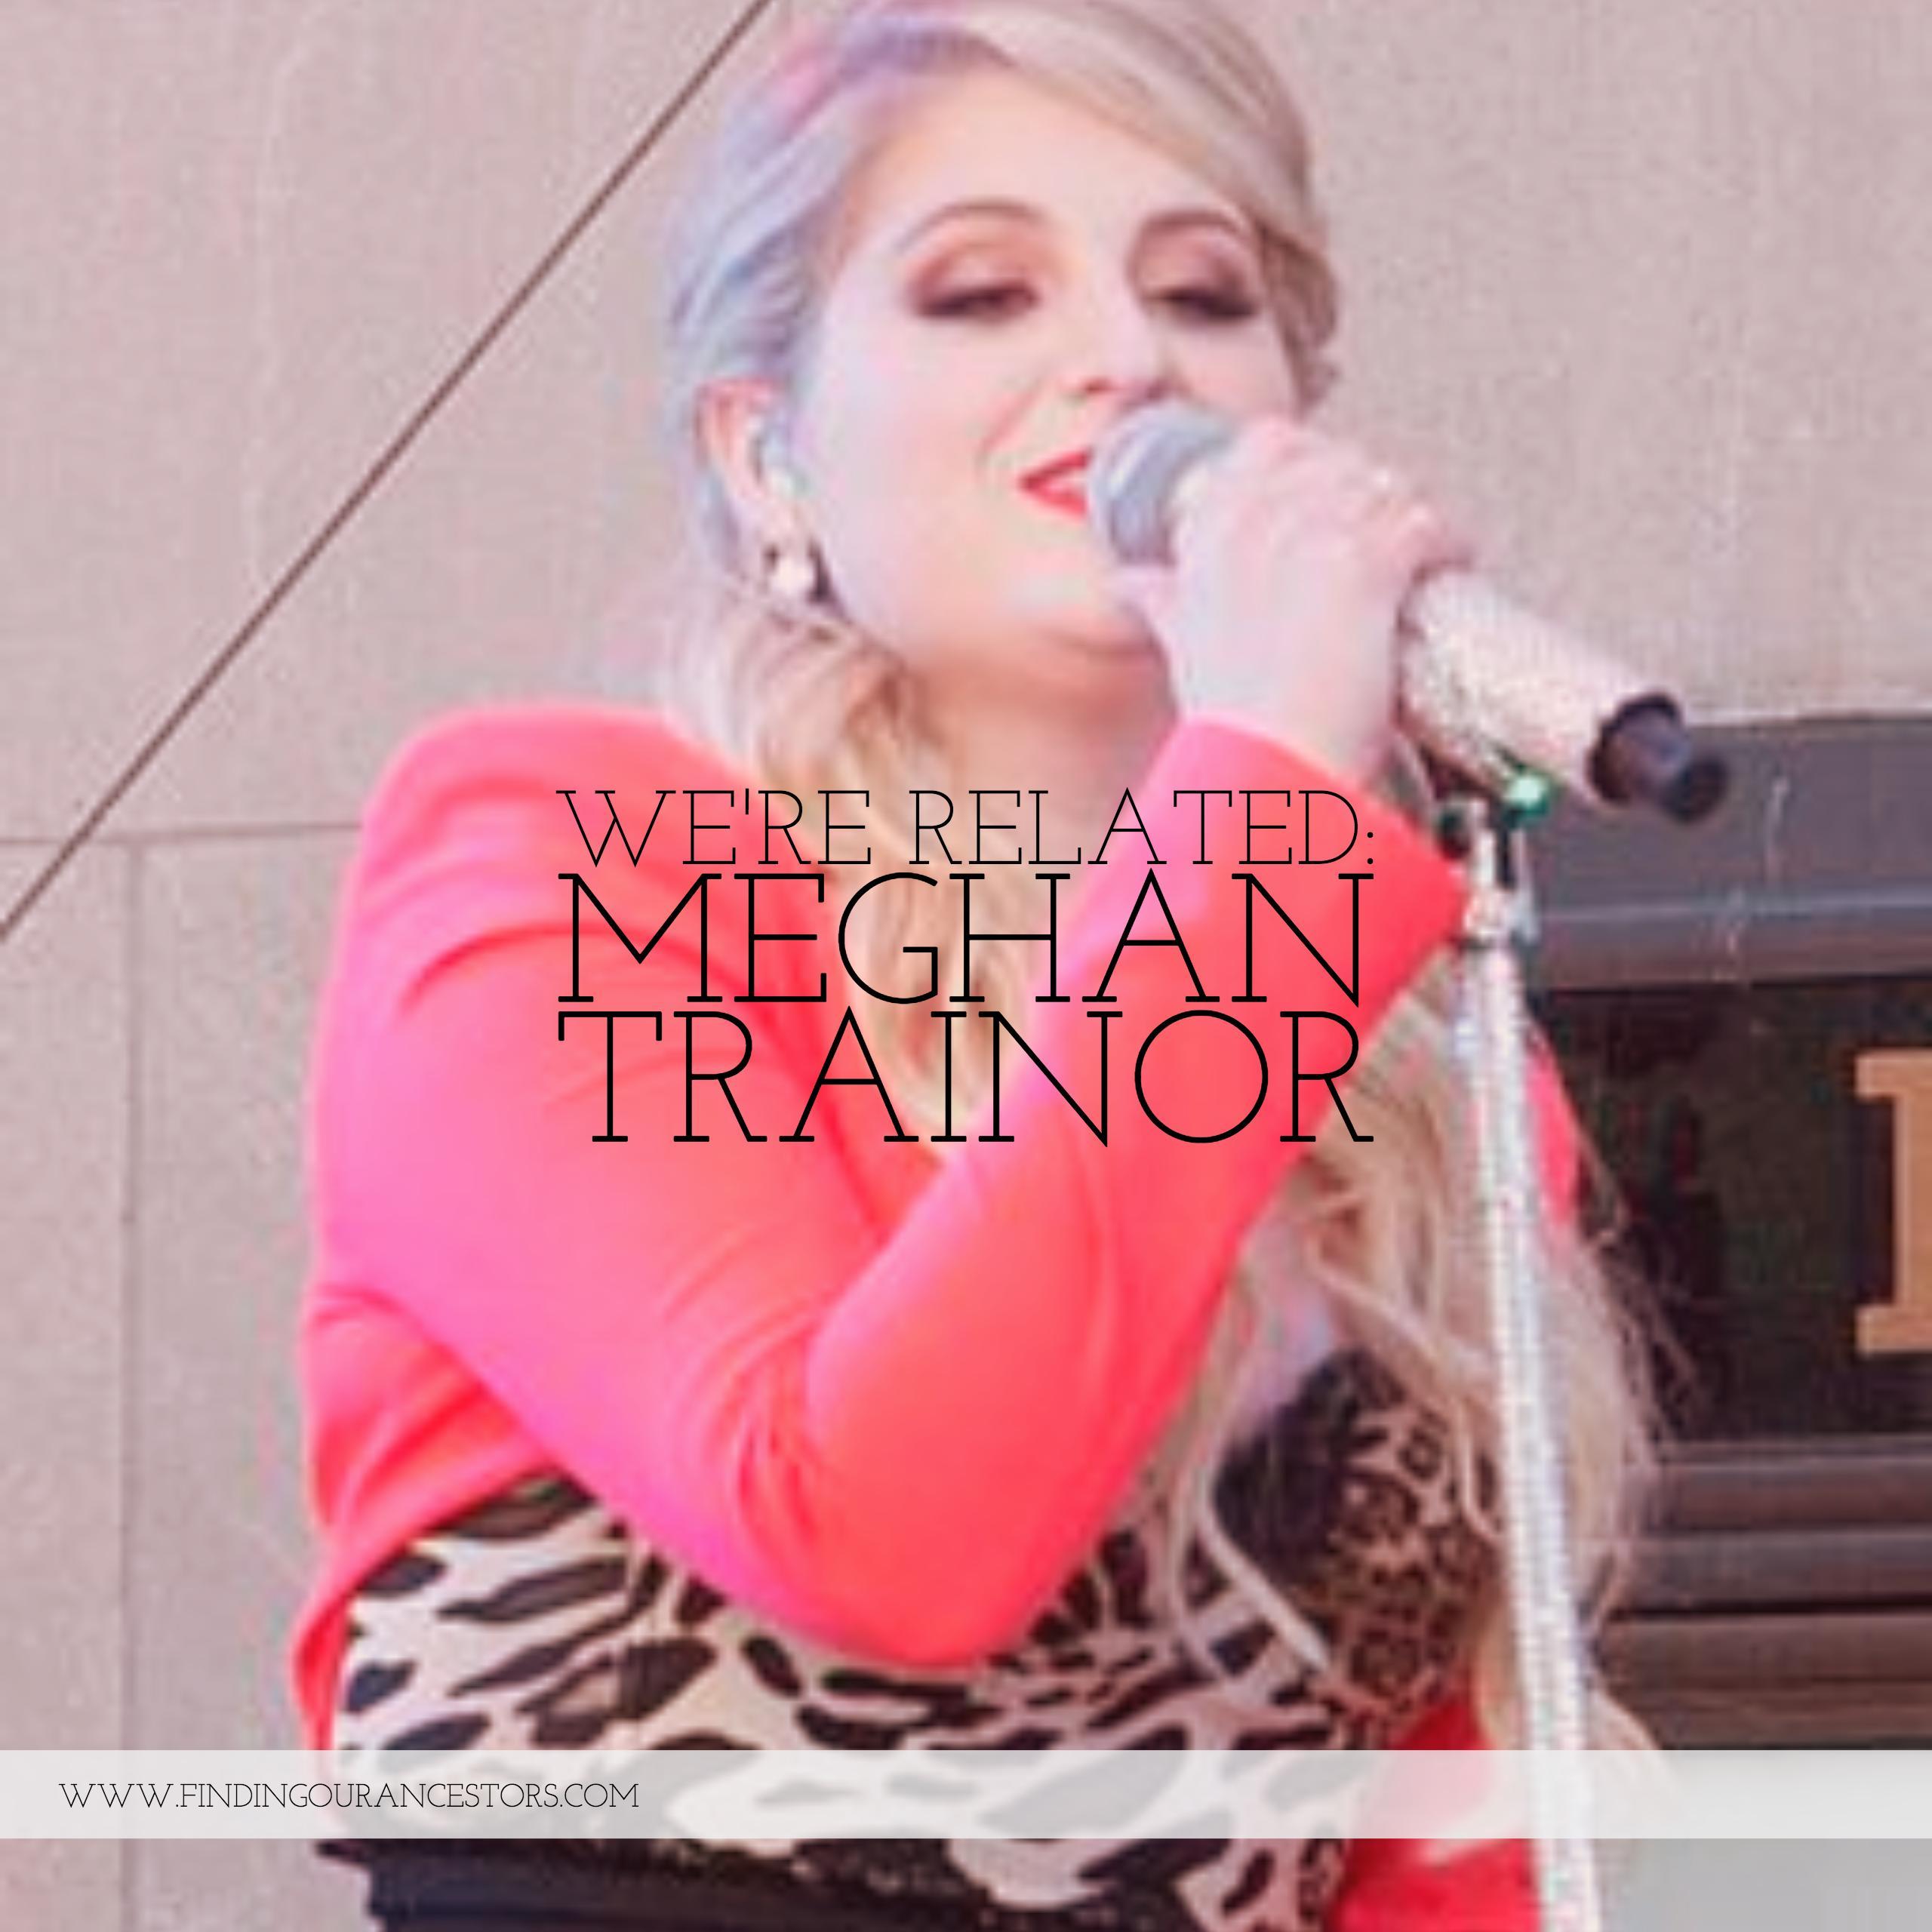 We're Related: Meghan Trainor